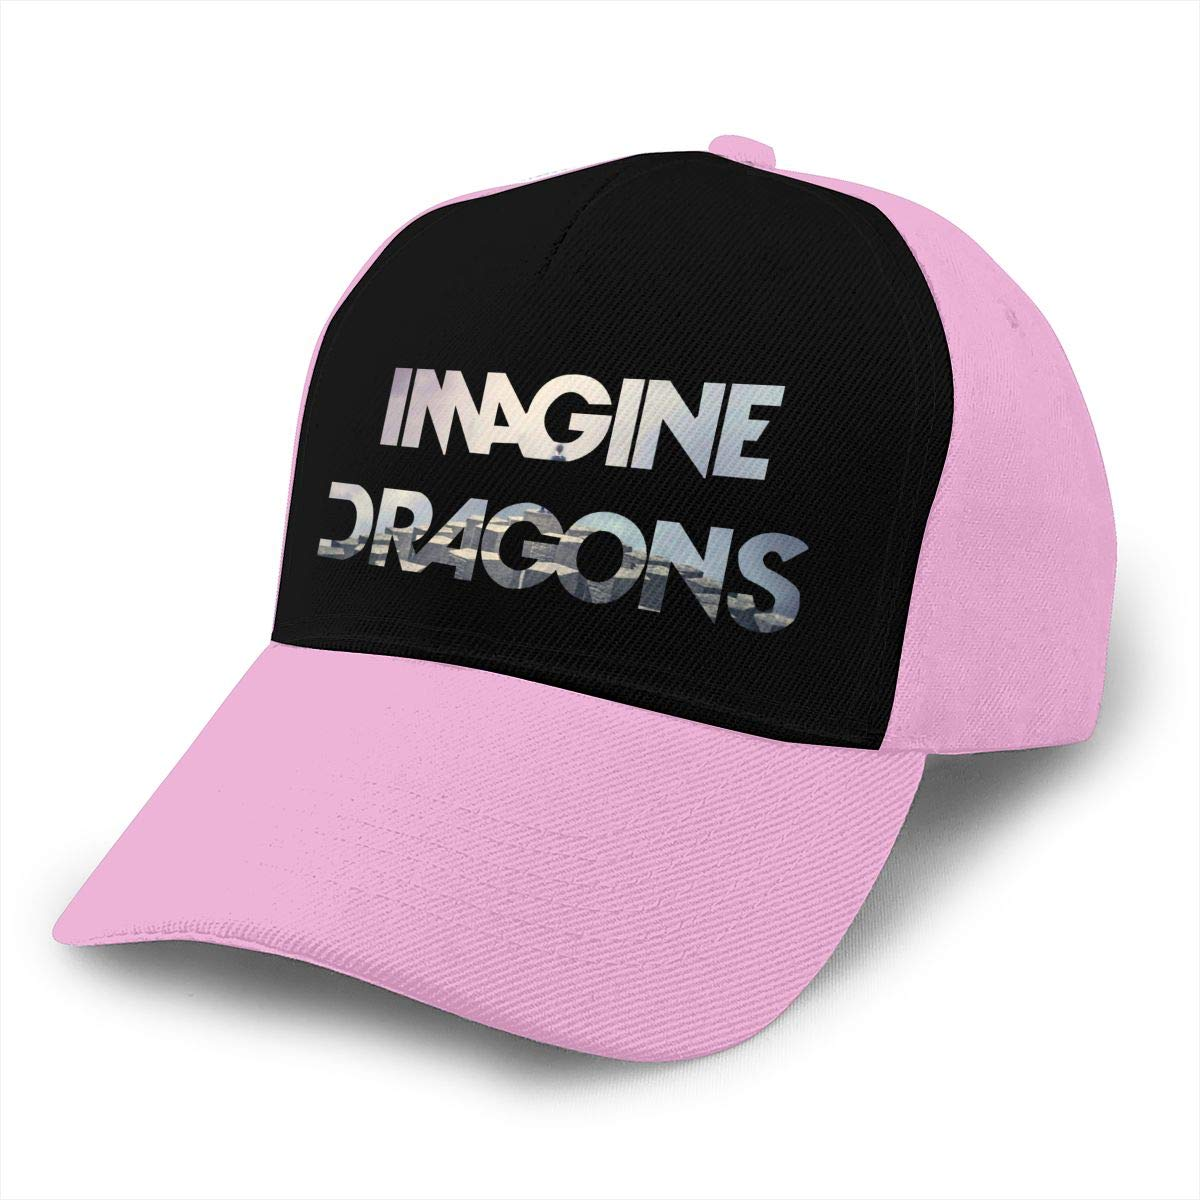 Adjustable Women Men Imagine The Dragons Print Baseball Cap Flat Brim Cap Hats Hip Hop Snapback Sun Hat Boys Girls Pink by Apolonia